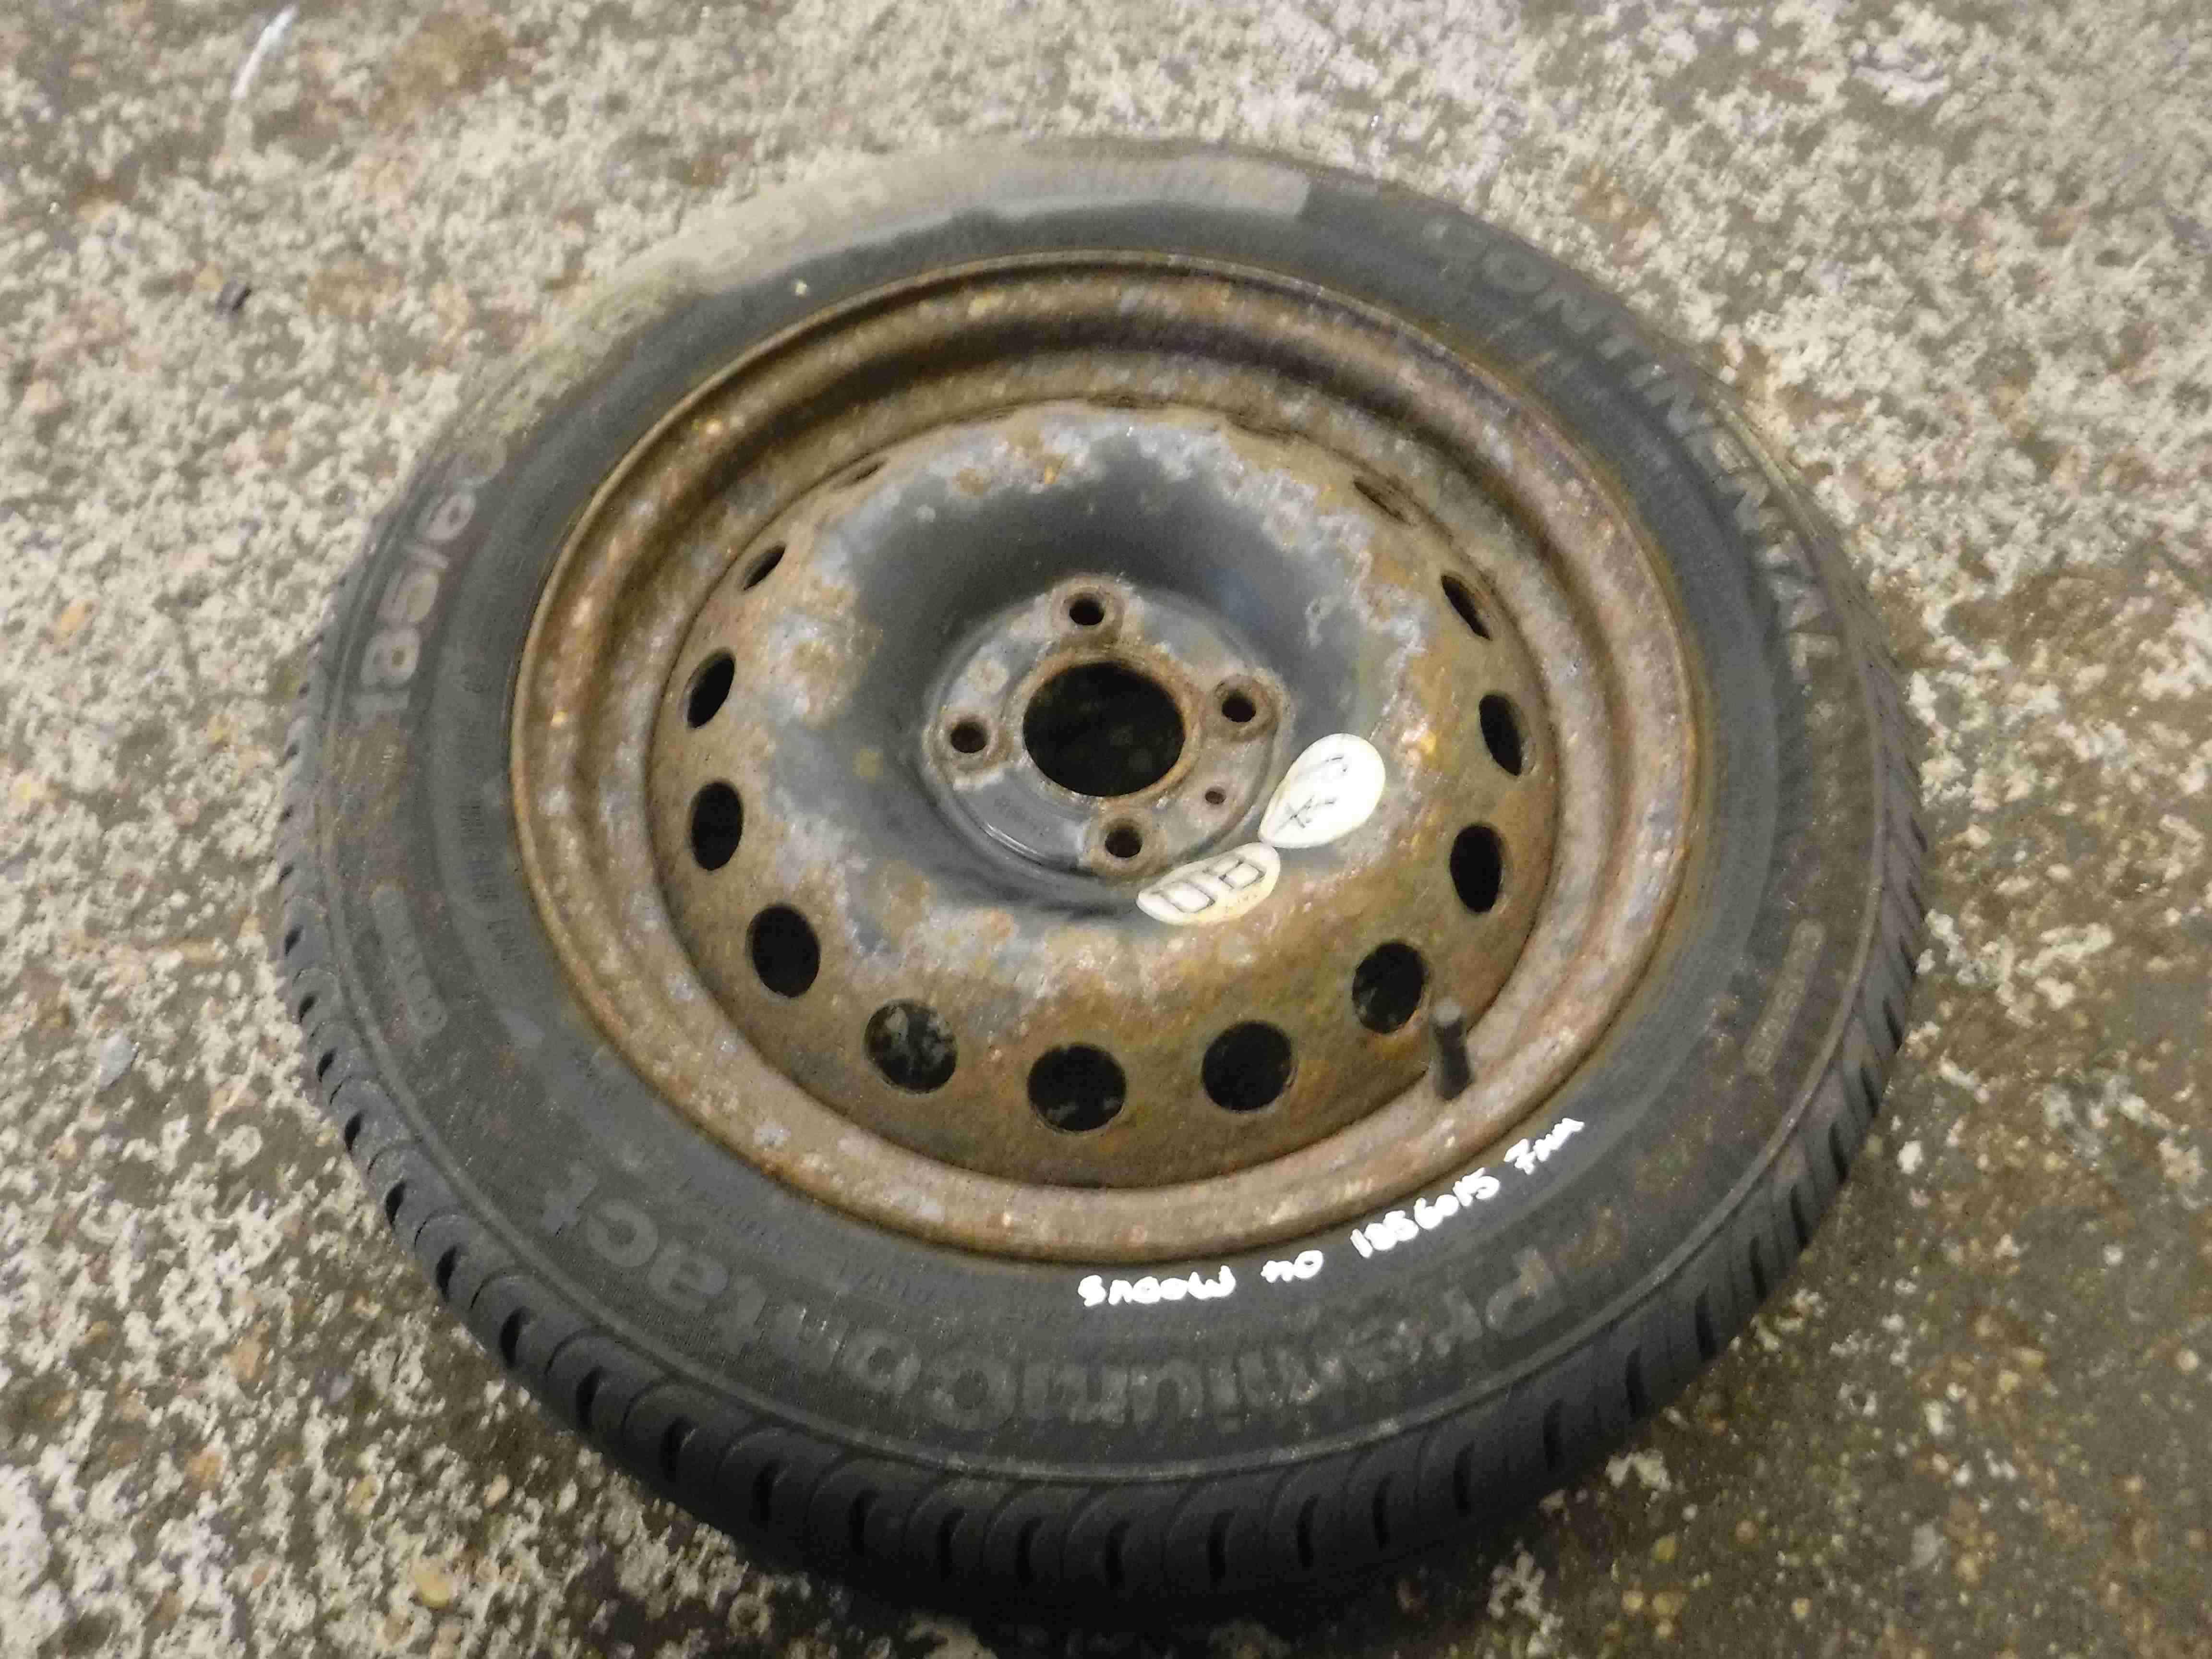 Renault Modus 2004-2008 Steel Wheel Rim + Tyre 185 60 15 7mm Tread 4/5